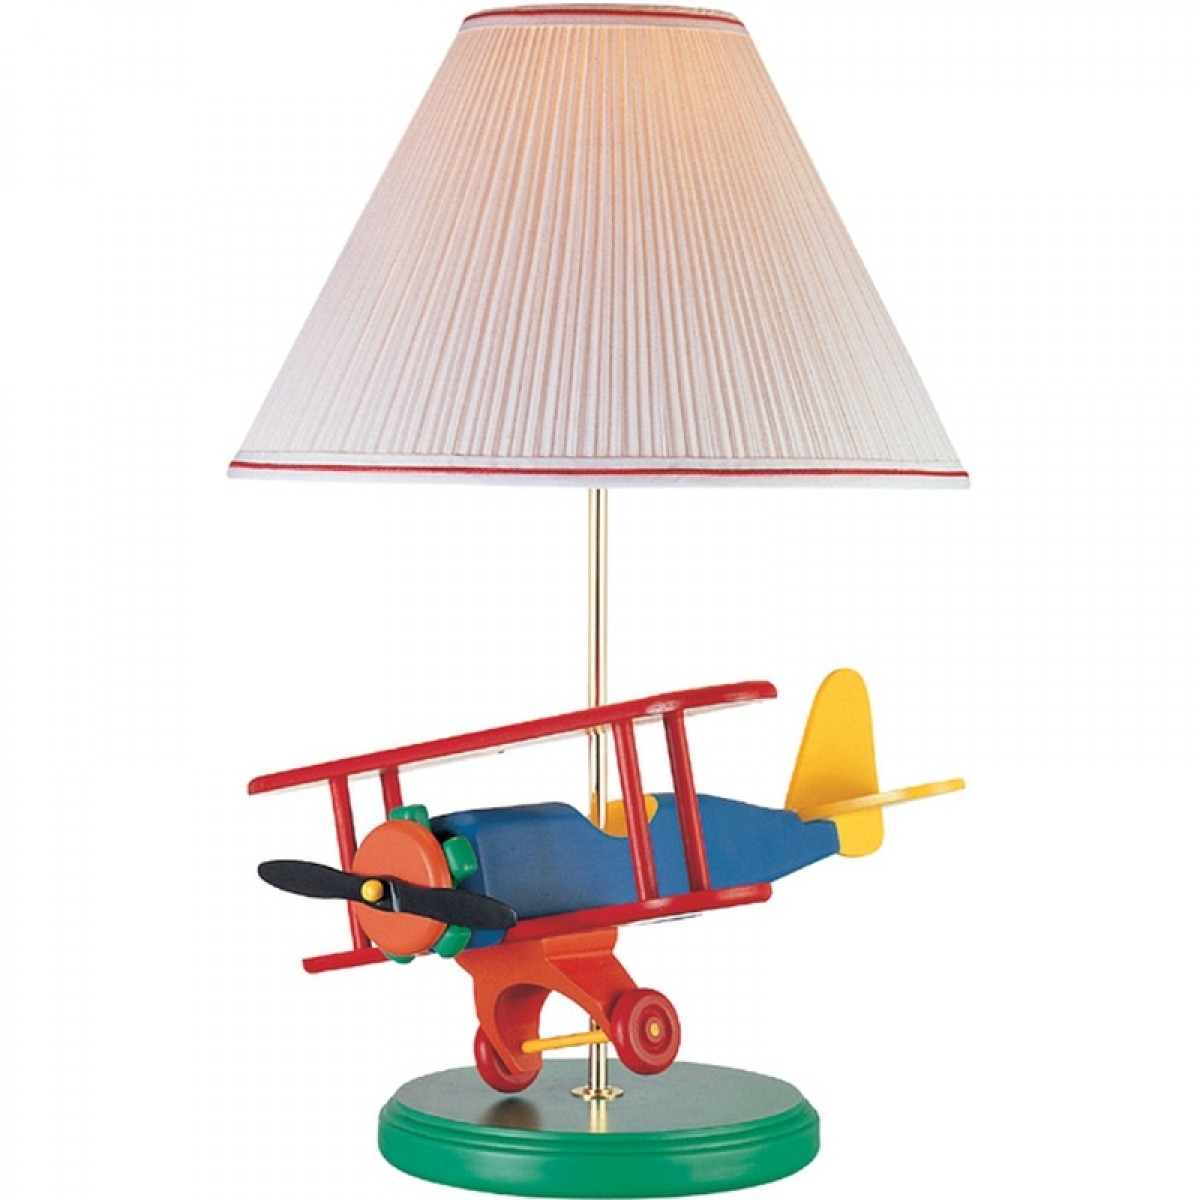 Kids Airplane Table Lamp Foter